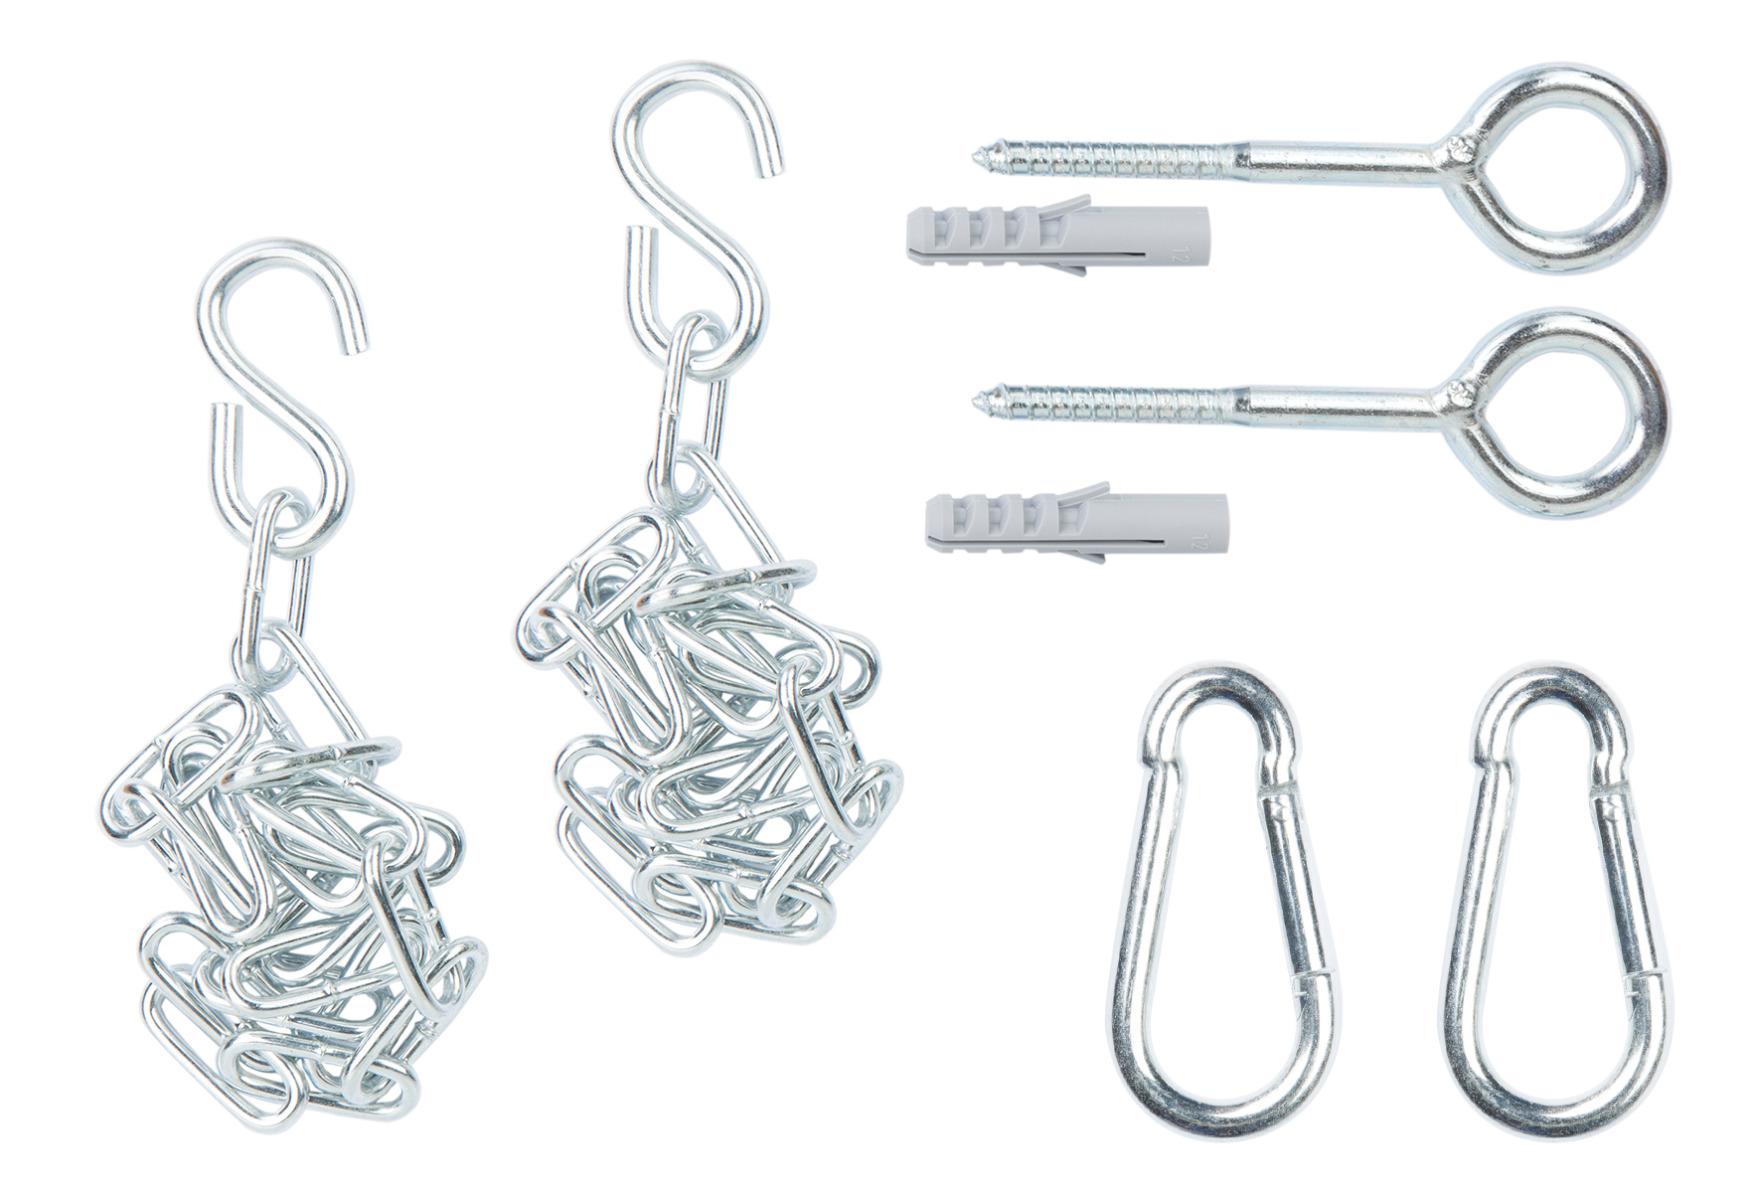 Hangmatbevestiging 'Complete' Metal - Tropilex �